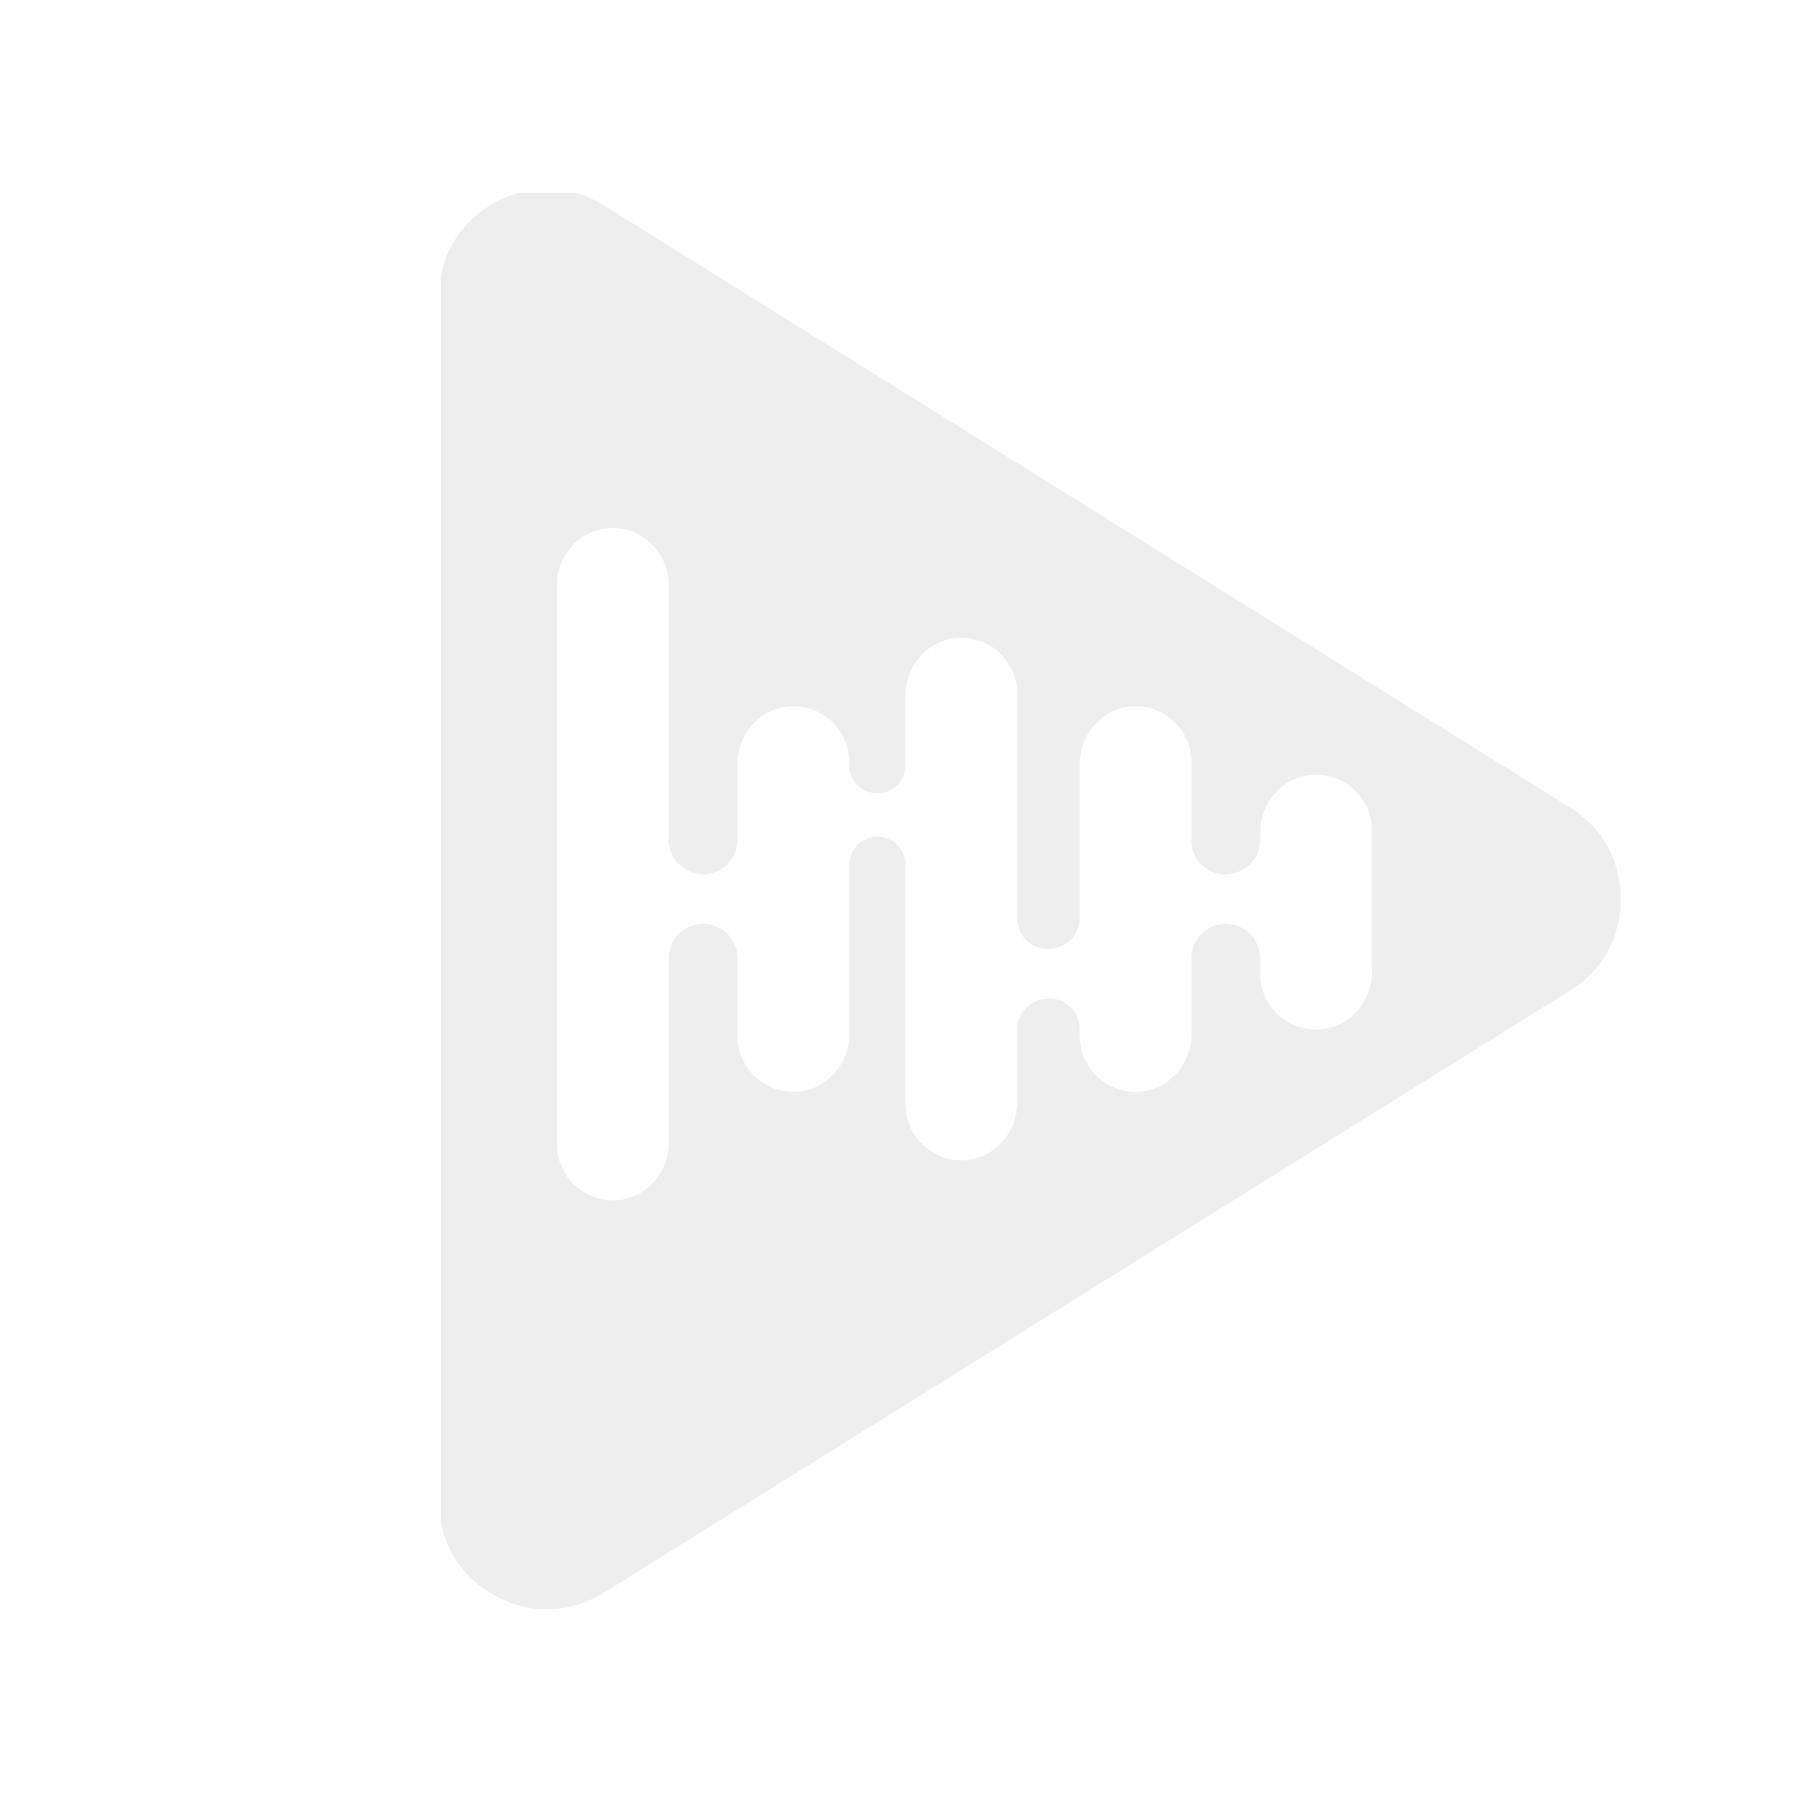 Hertz Dieci DCX 460.3 - 2-veis 4x6